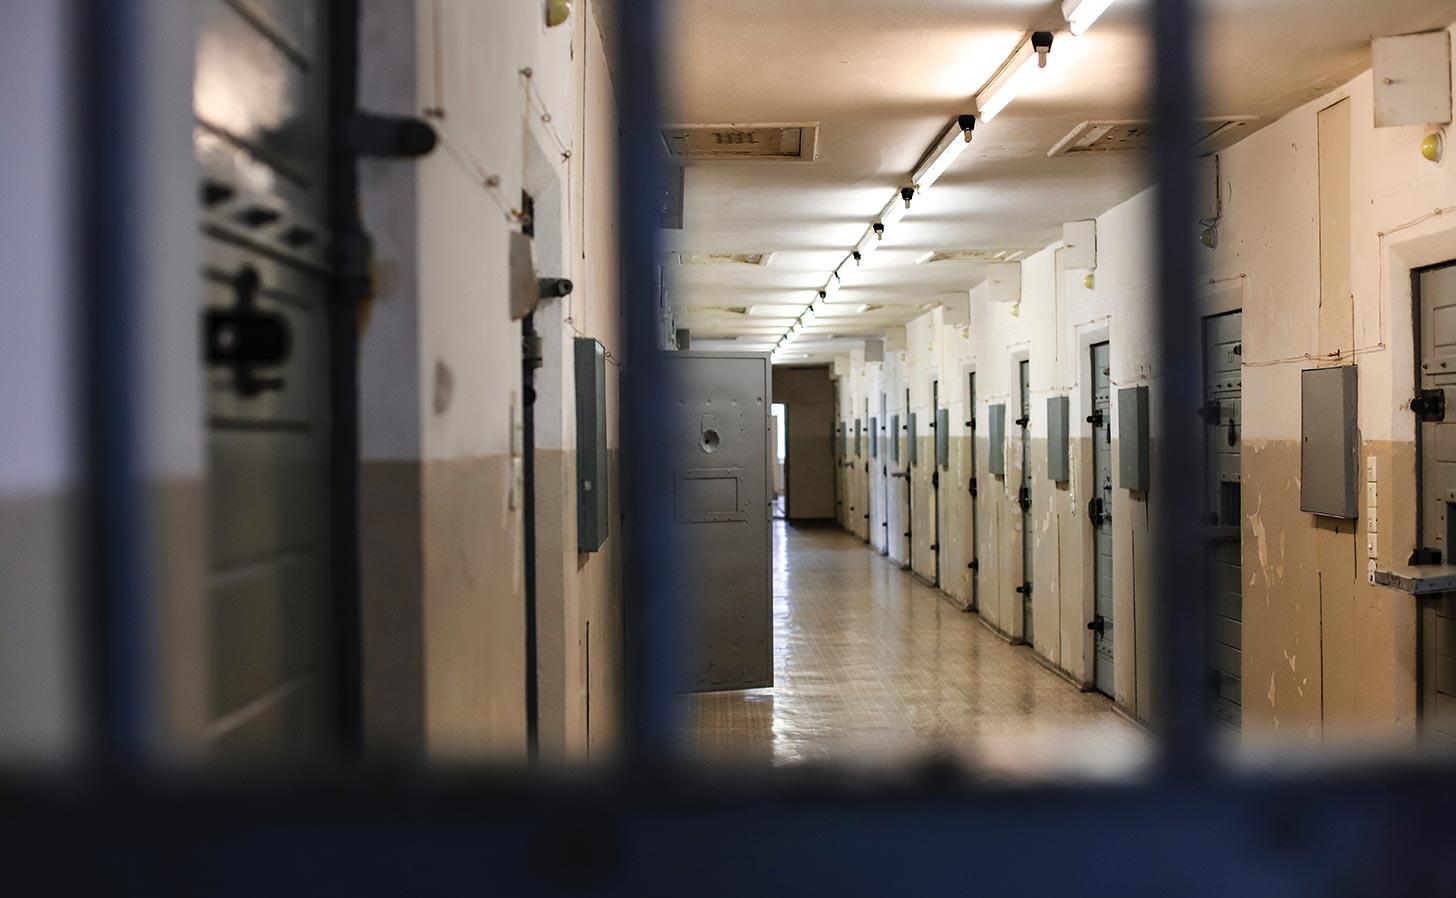 Fängelse. Foto: Matthew Ansley / Unsplash